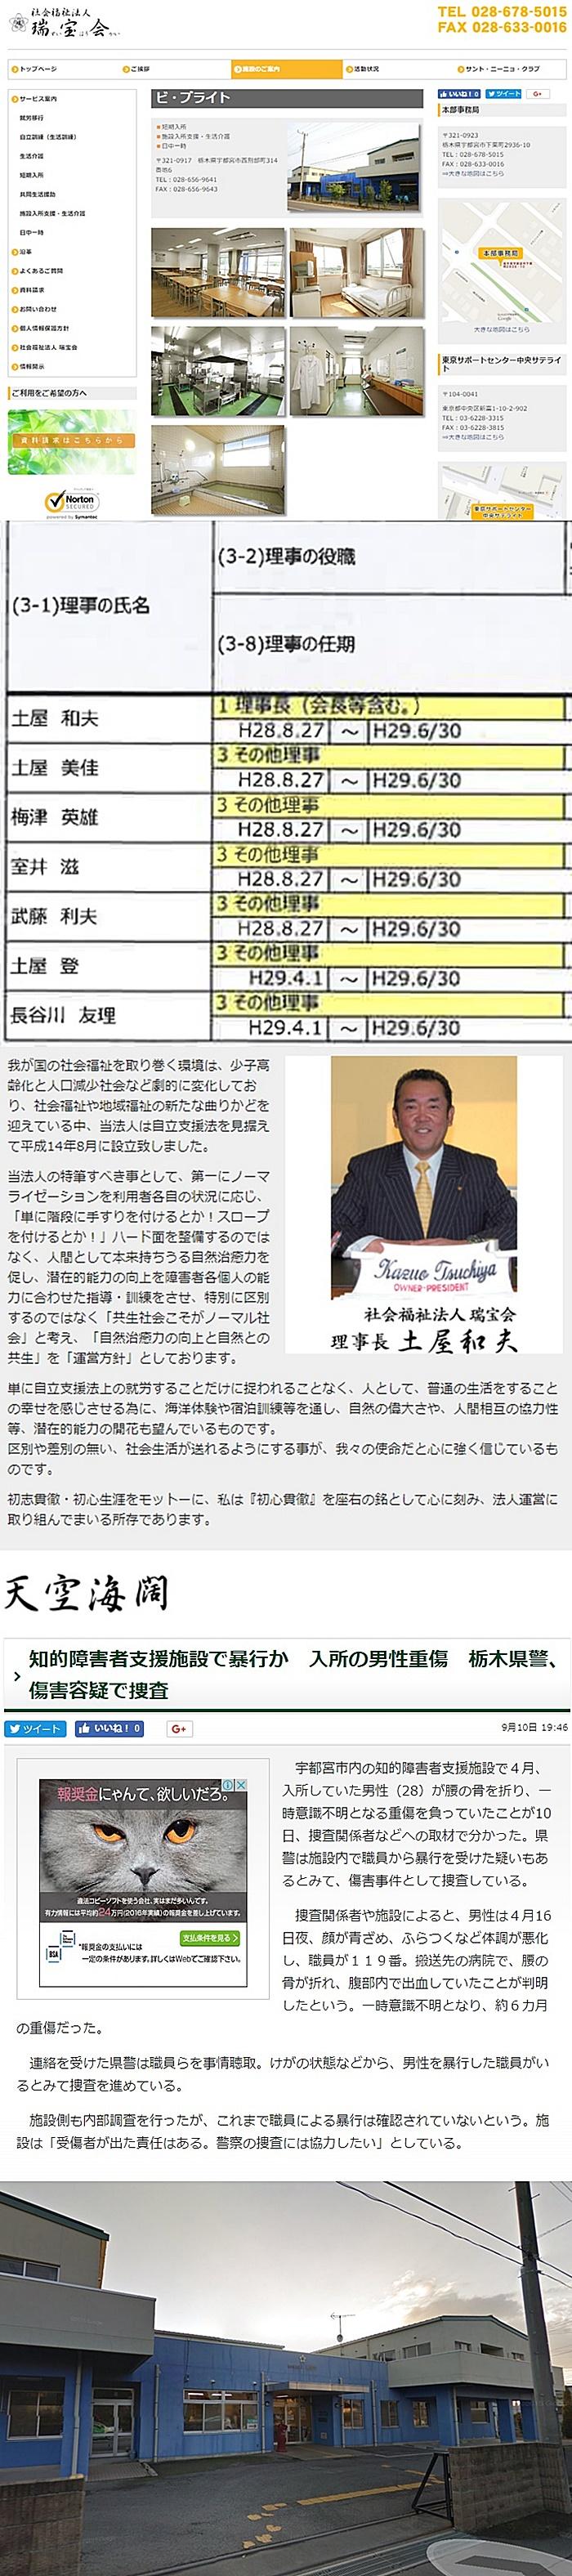 社会福祉法人瑞宝会 土屋和夫理事長 ビ・ブライト 2 (2)